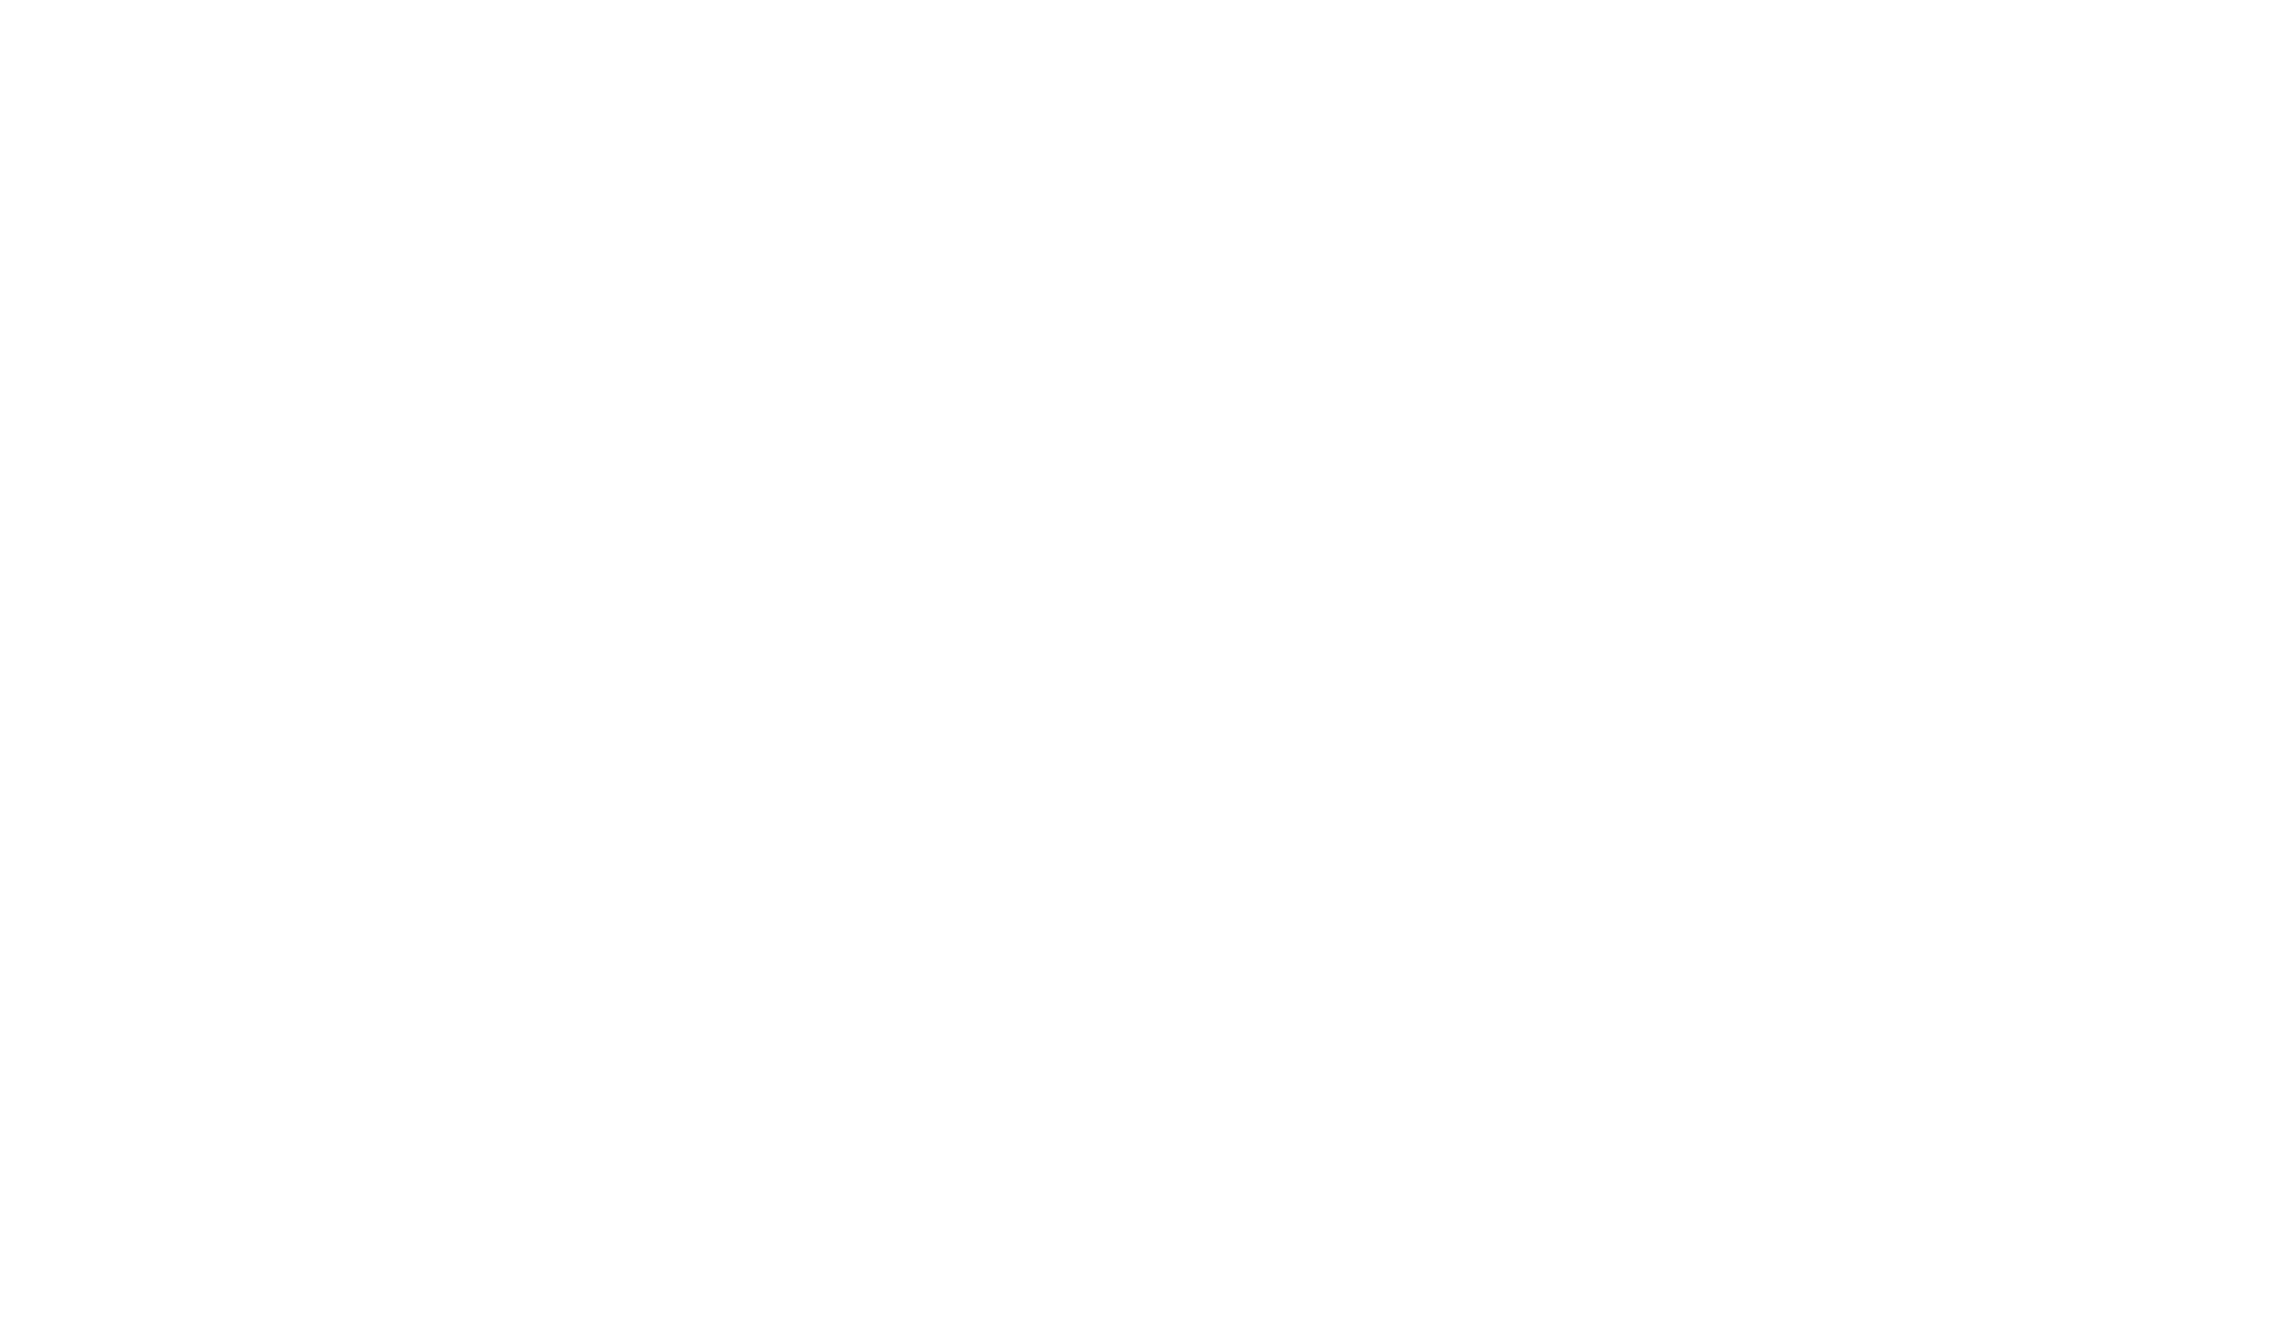 RiverbendElectric_Vertical_AllWhite-01